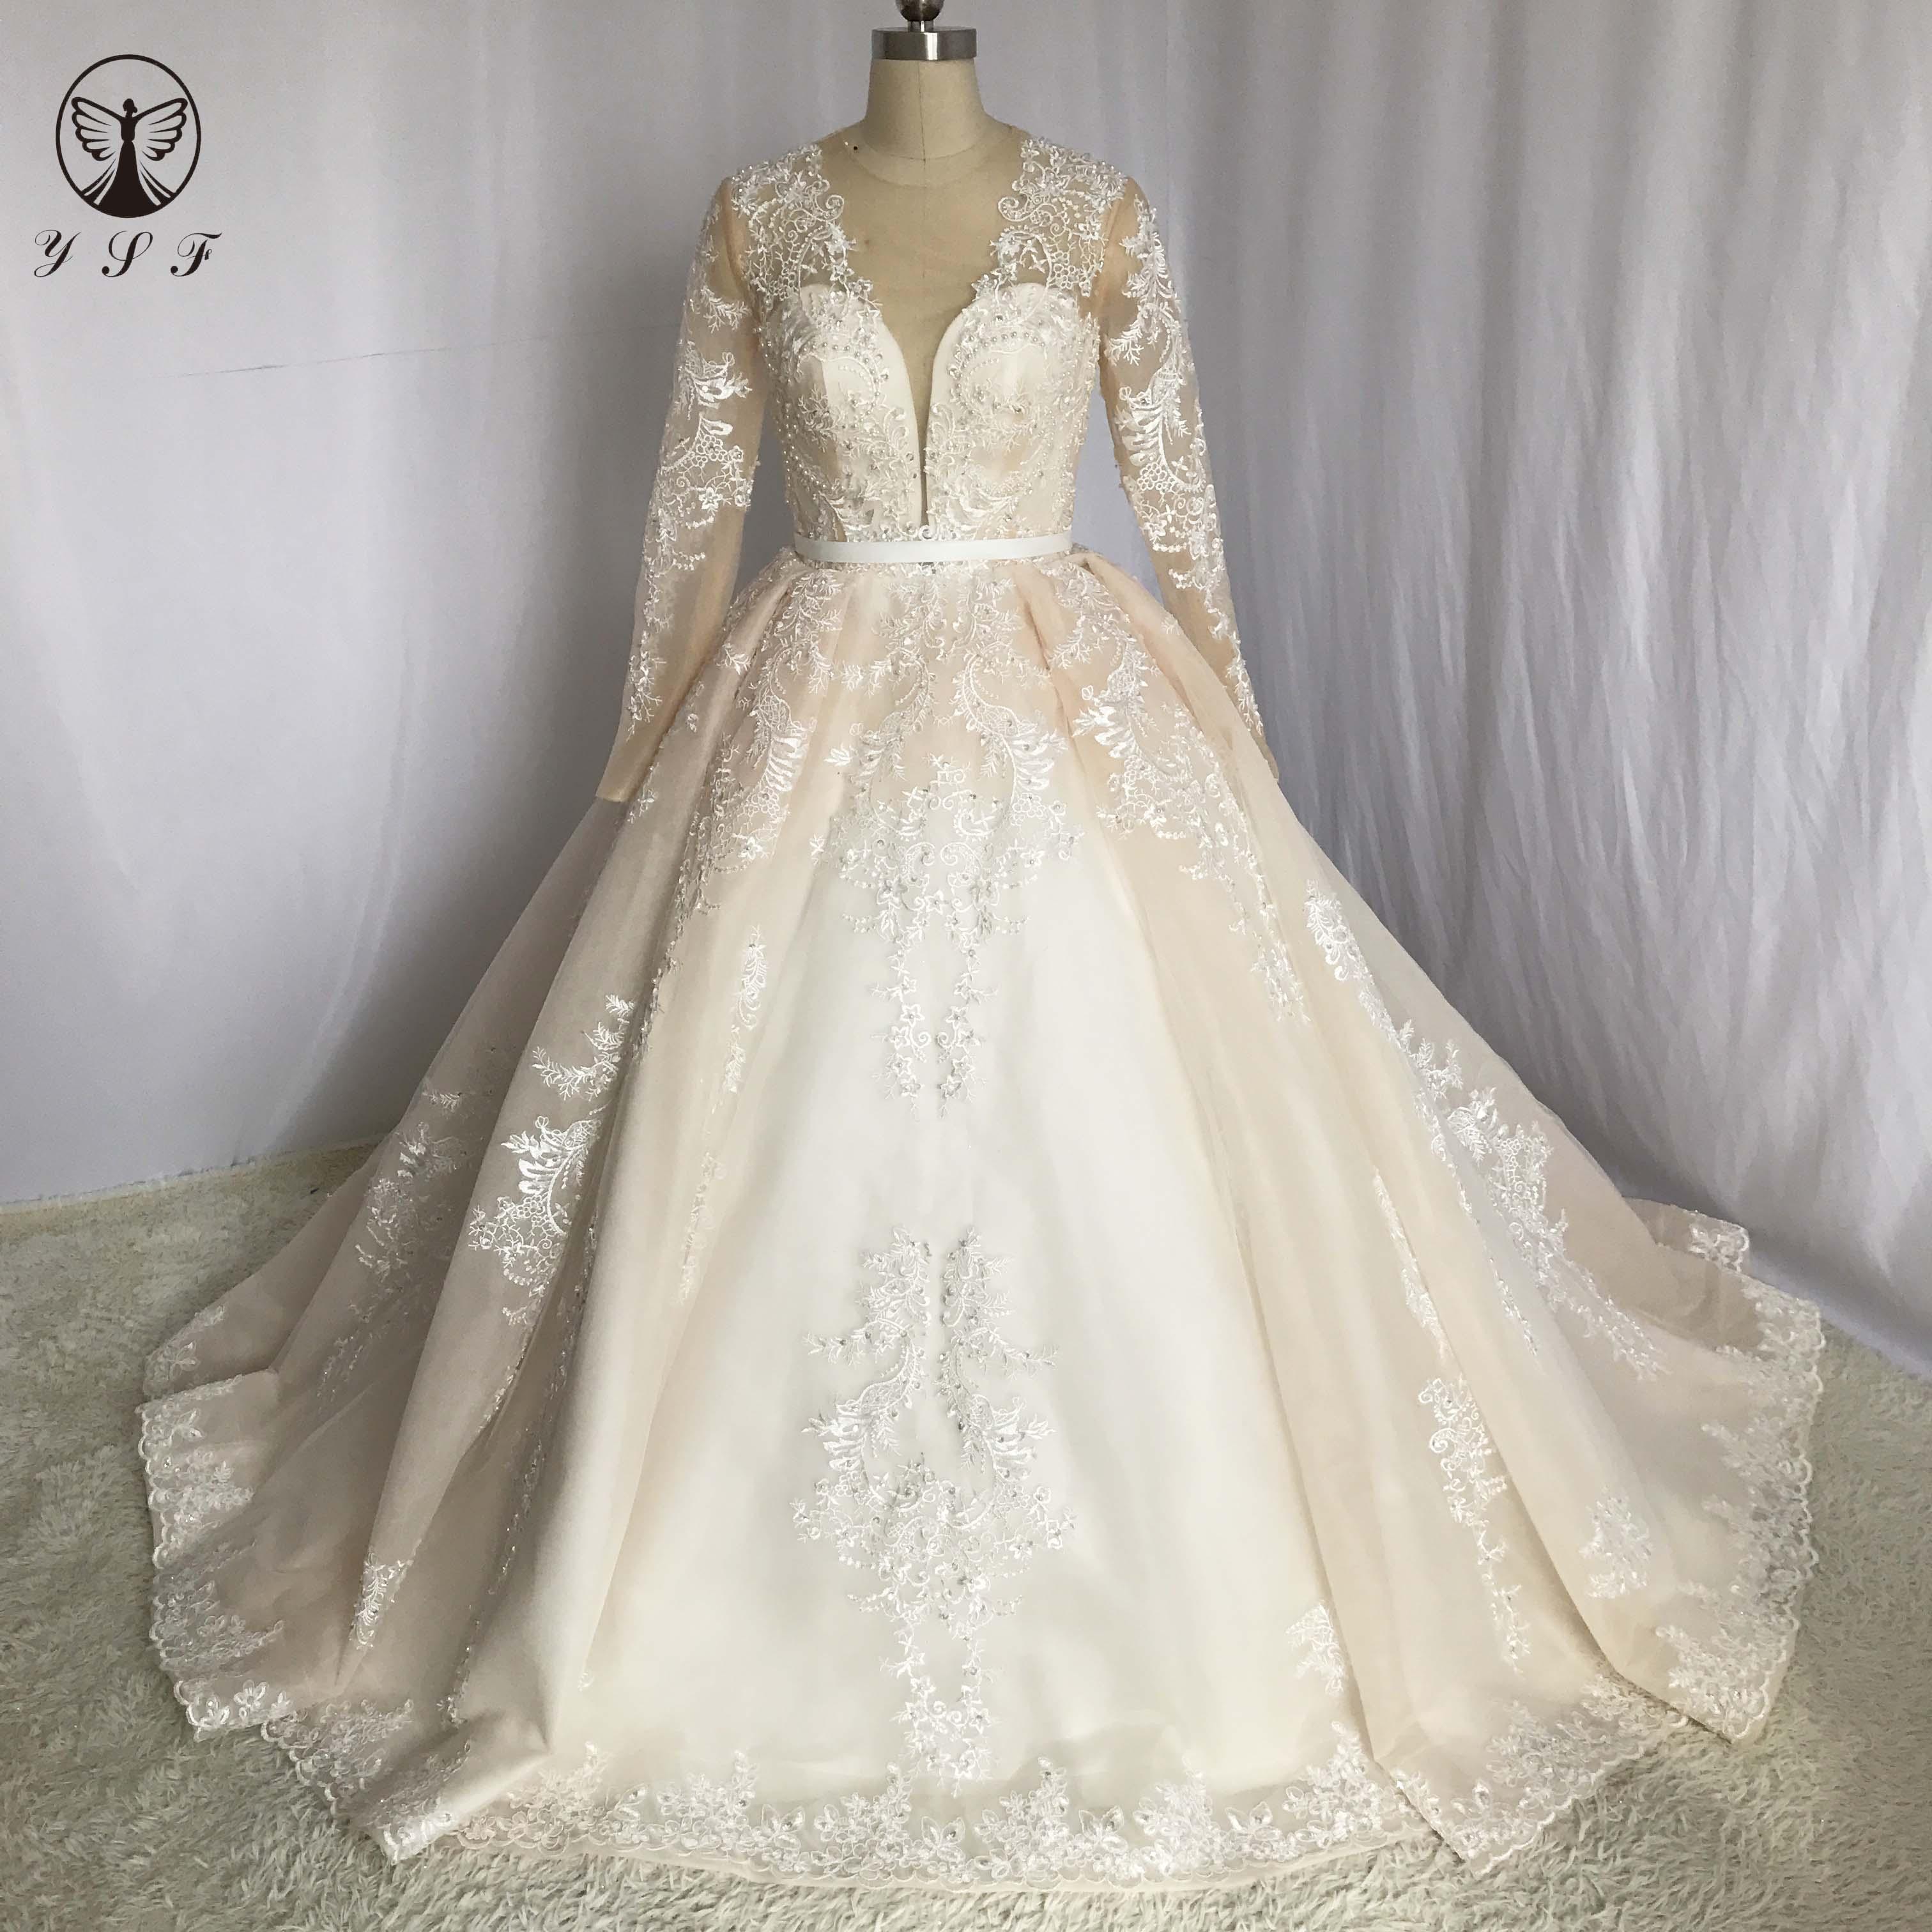 Vintage Vestidos De Novias O Neck Appliqued Beaded Pleated Ball Gown Long Sleeve Champagne Wedding Dresses